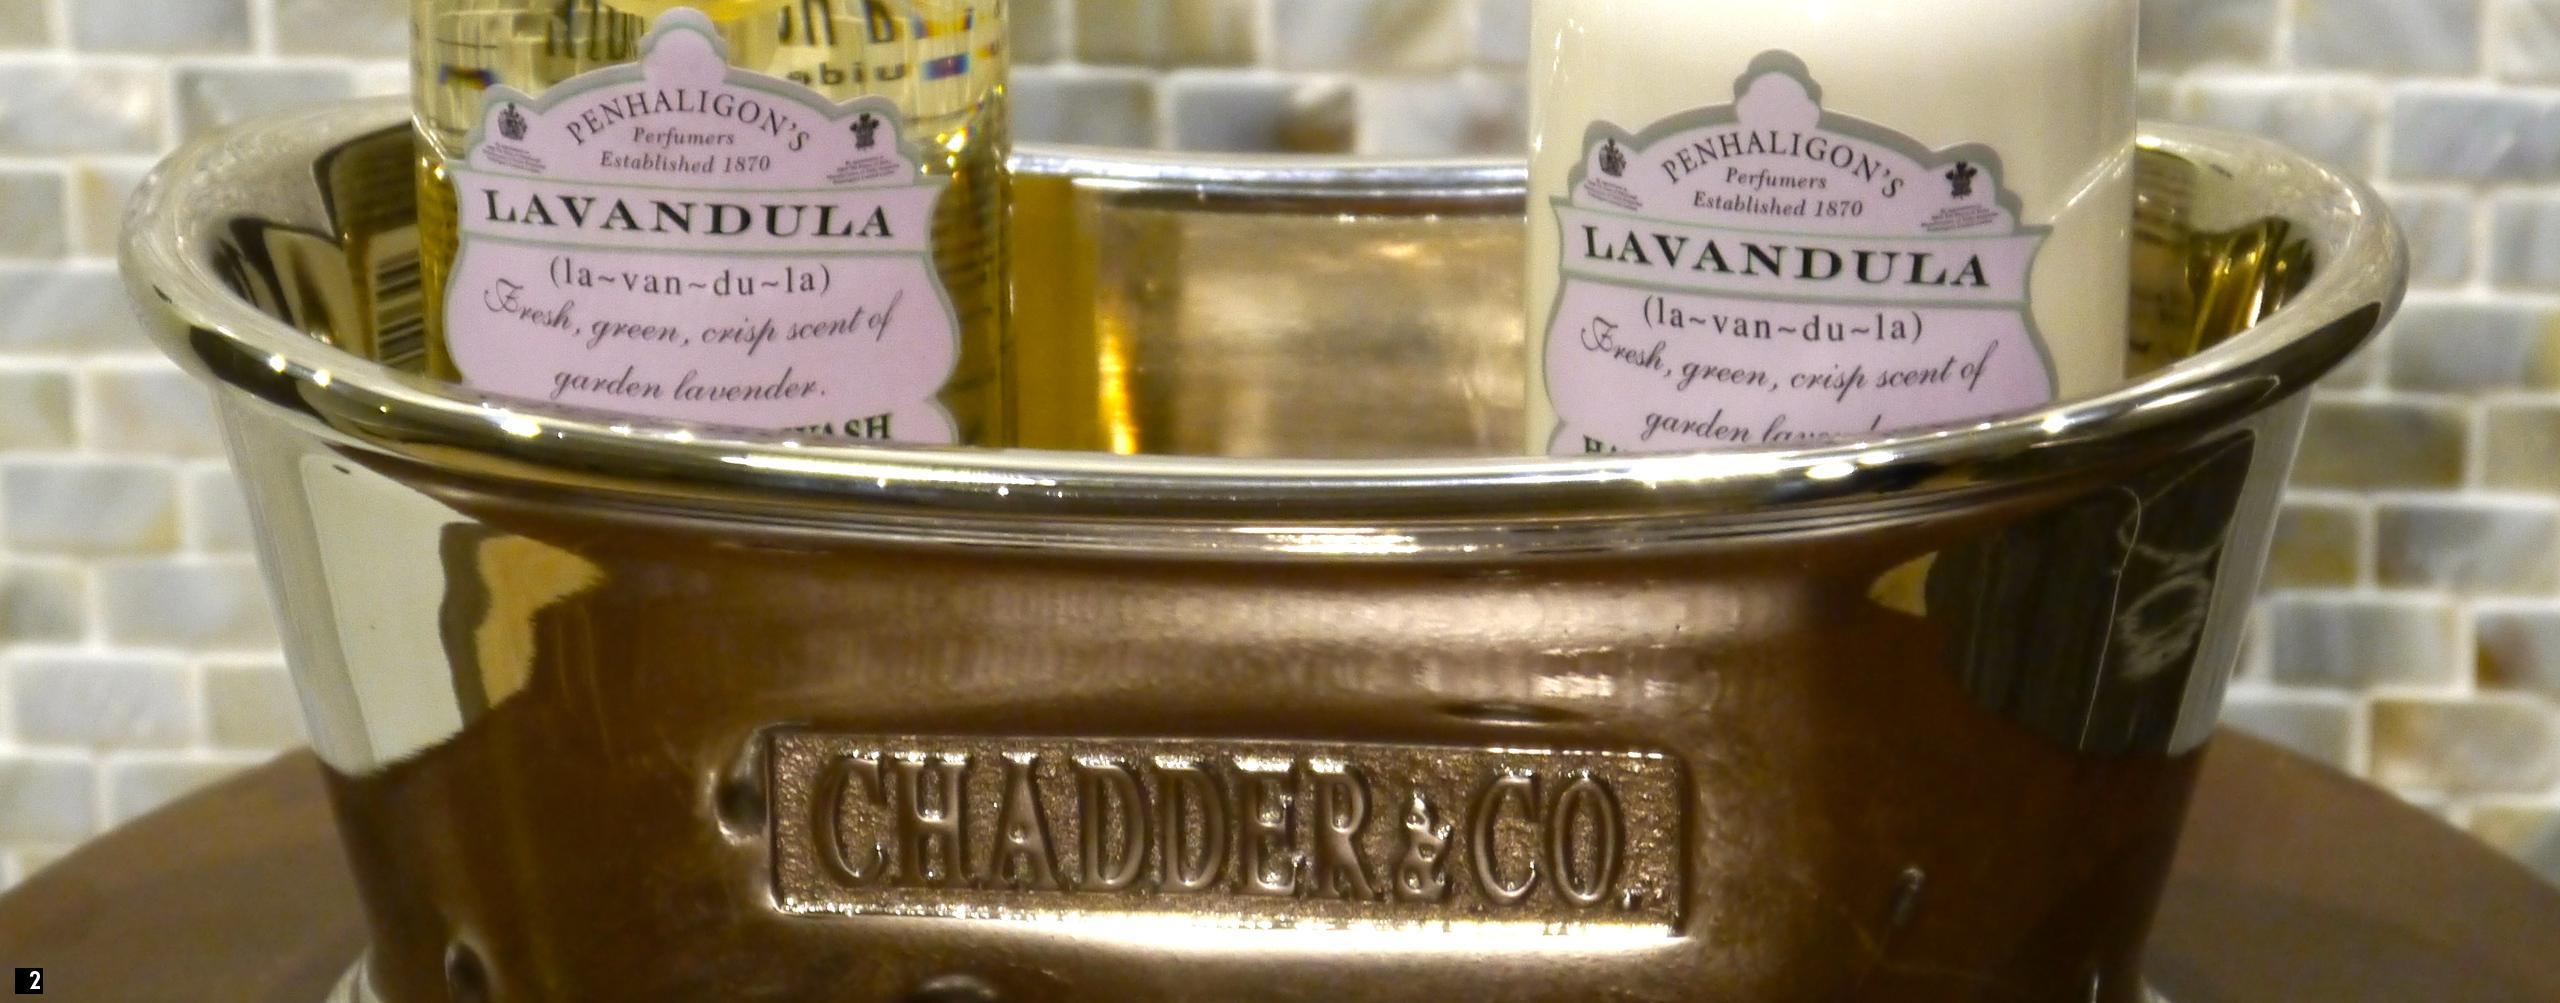 Chadder Royal Accessories, Small polished bath